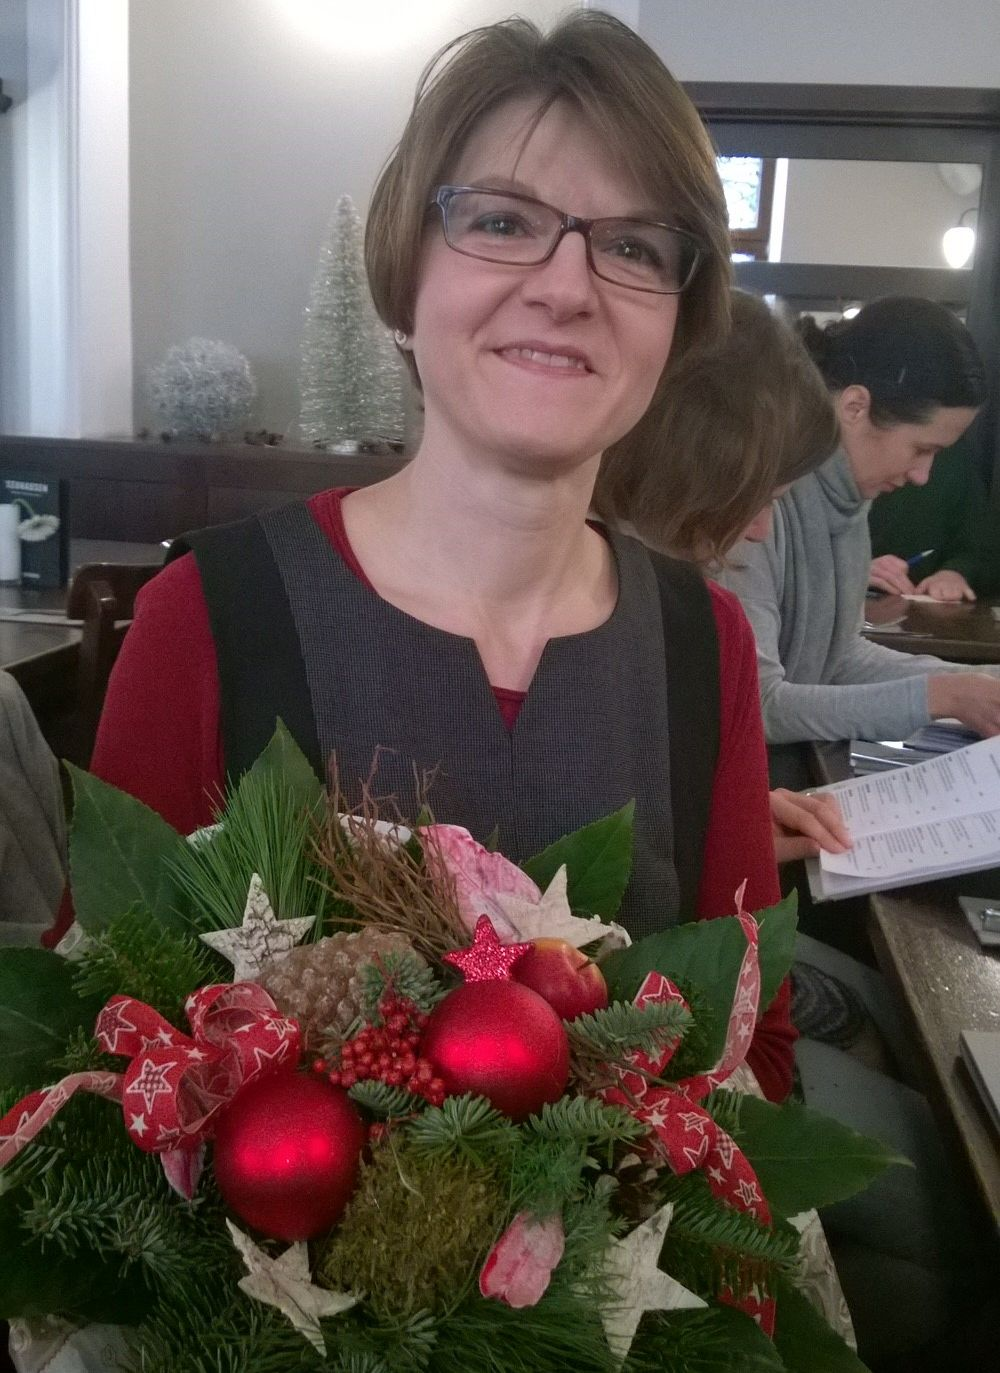 Apothekerin Ulrike Kuhn